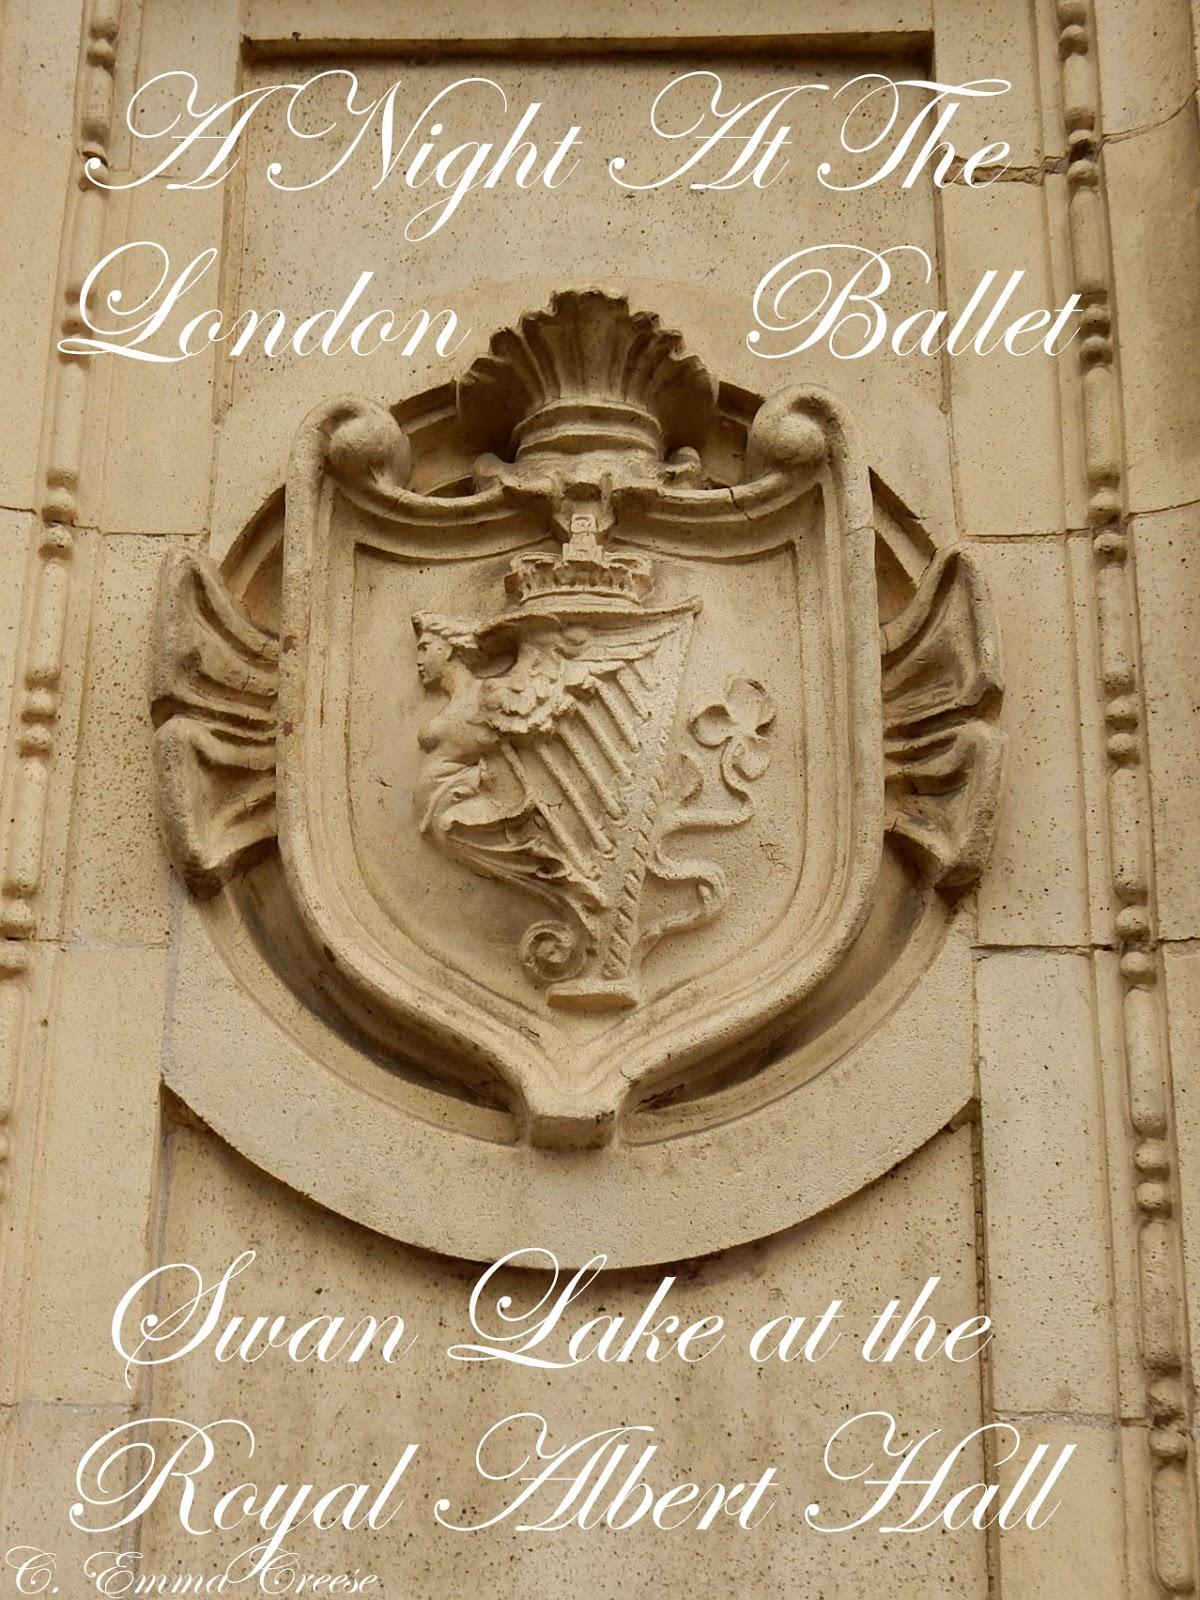 Swan Lake - A Night At The London Ballet Adventures of a London Kiwi